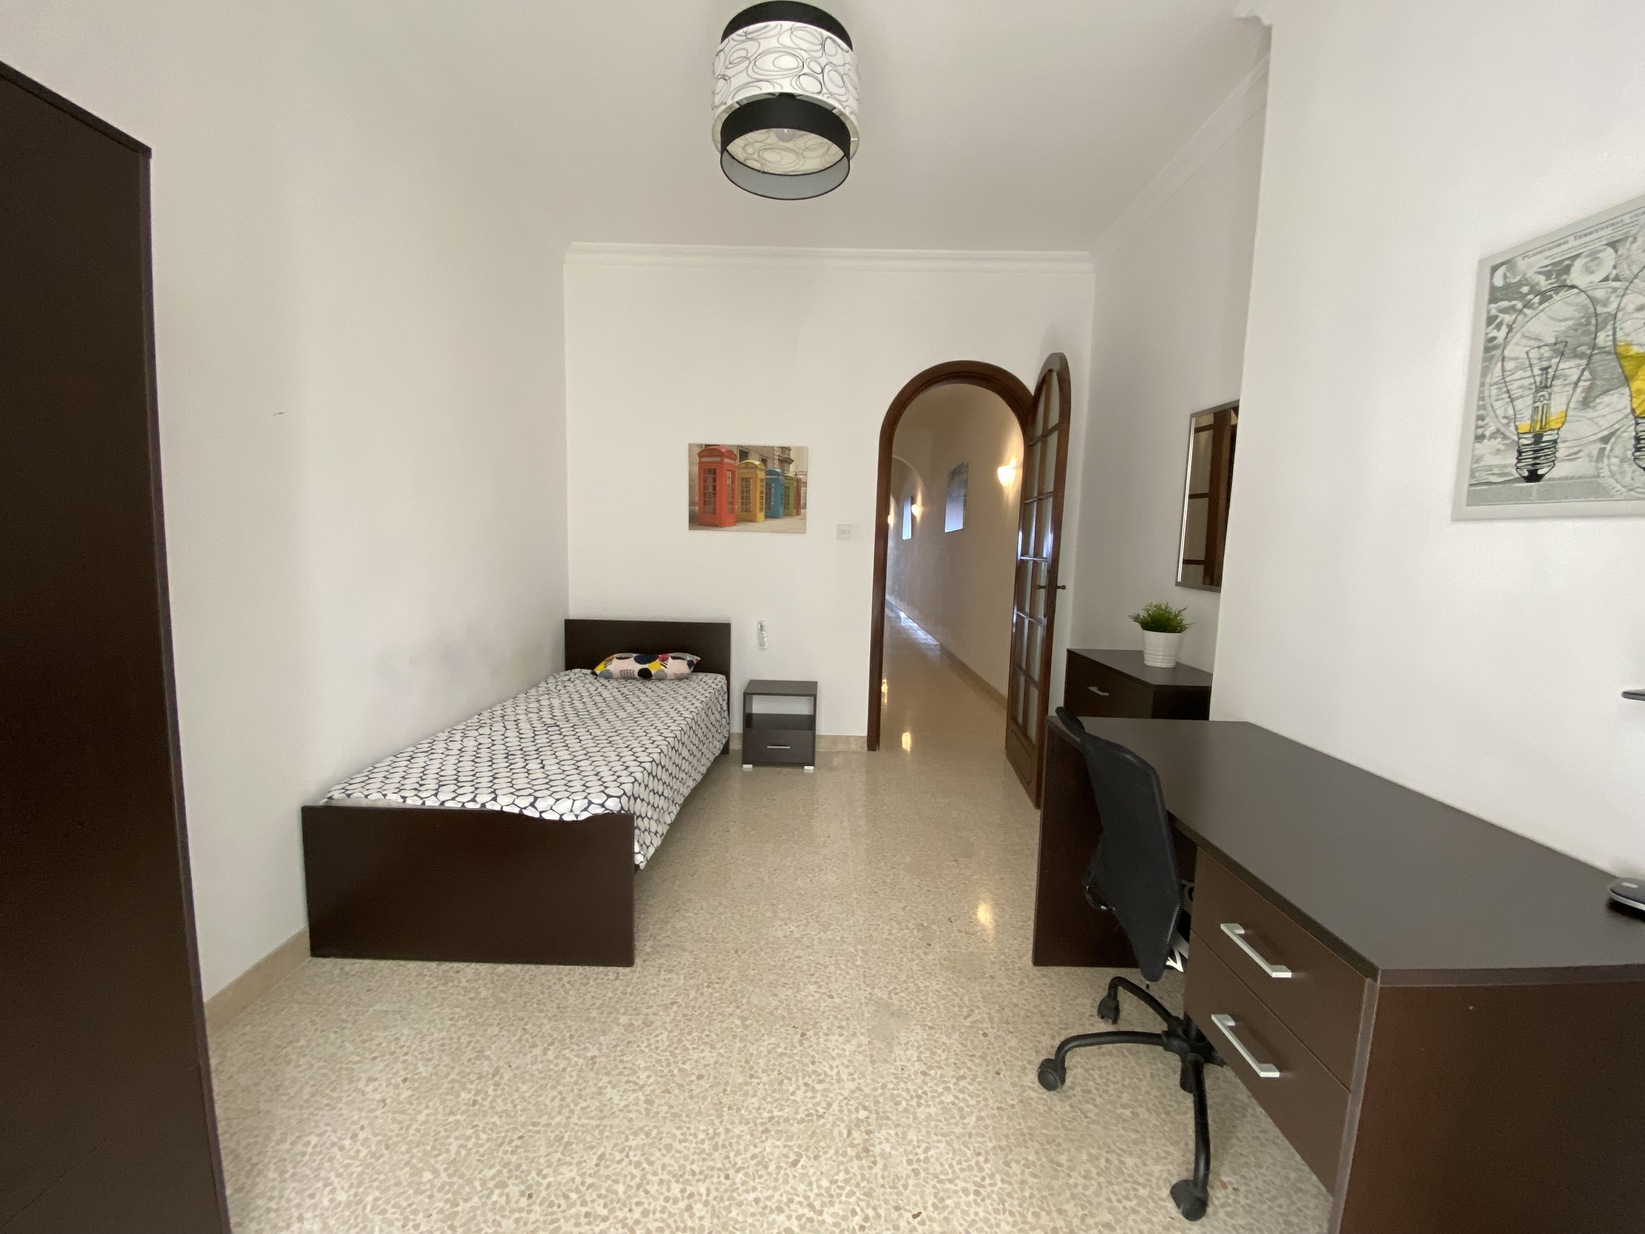 3 bed Apartment For Rent in Sliema, Sliema - thumb 16